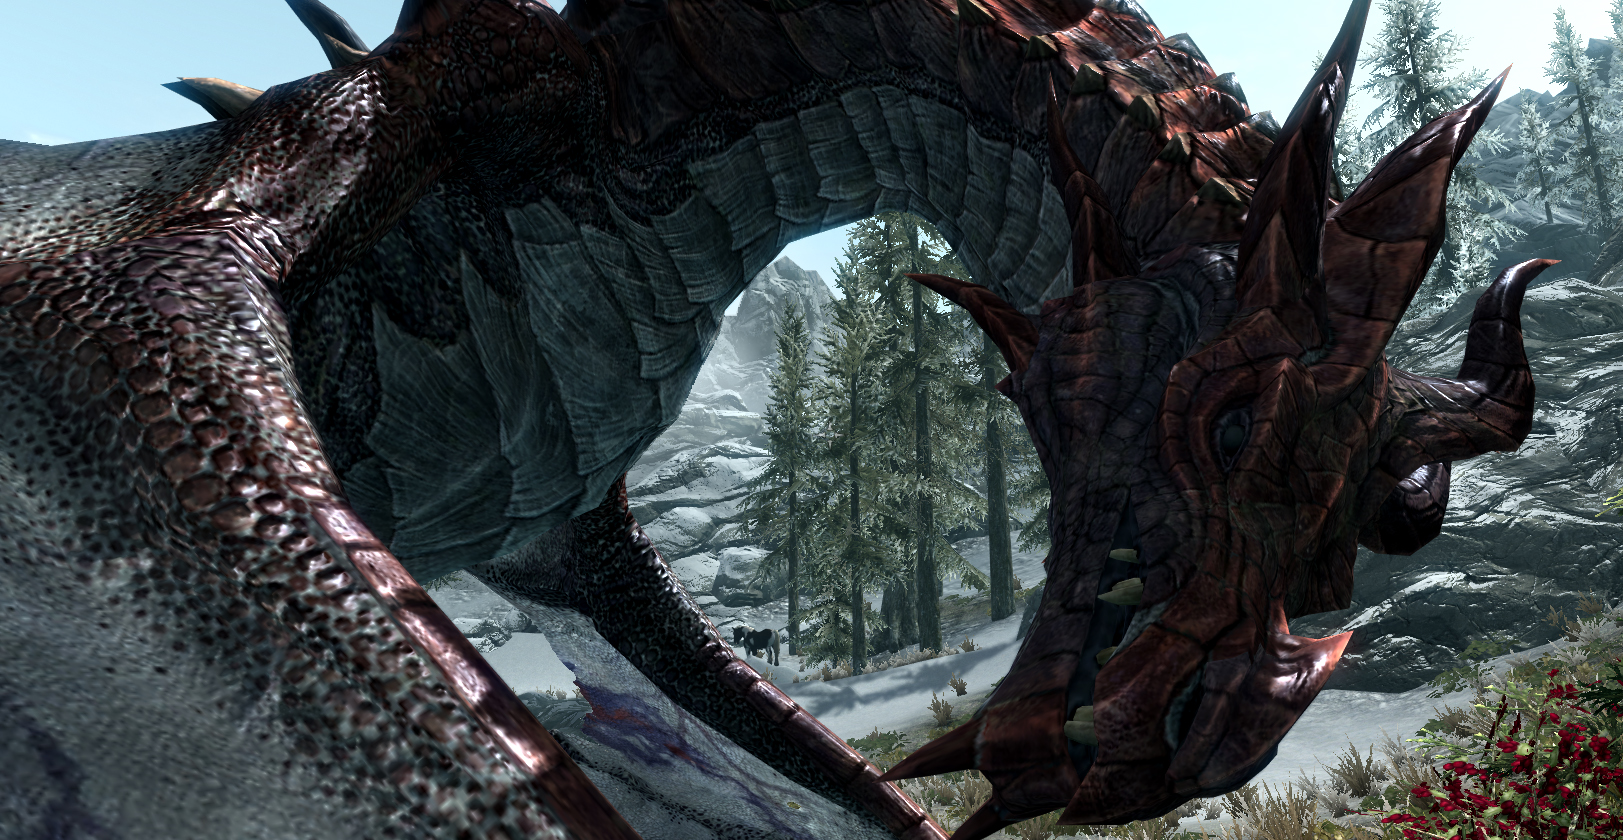 Odahviing (Skyrim) | Elder Scrolls | FANDOM powered by Wikia